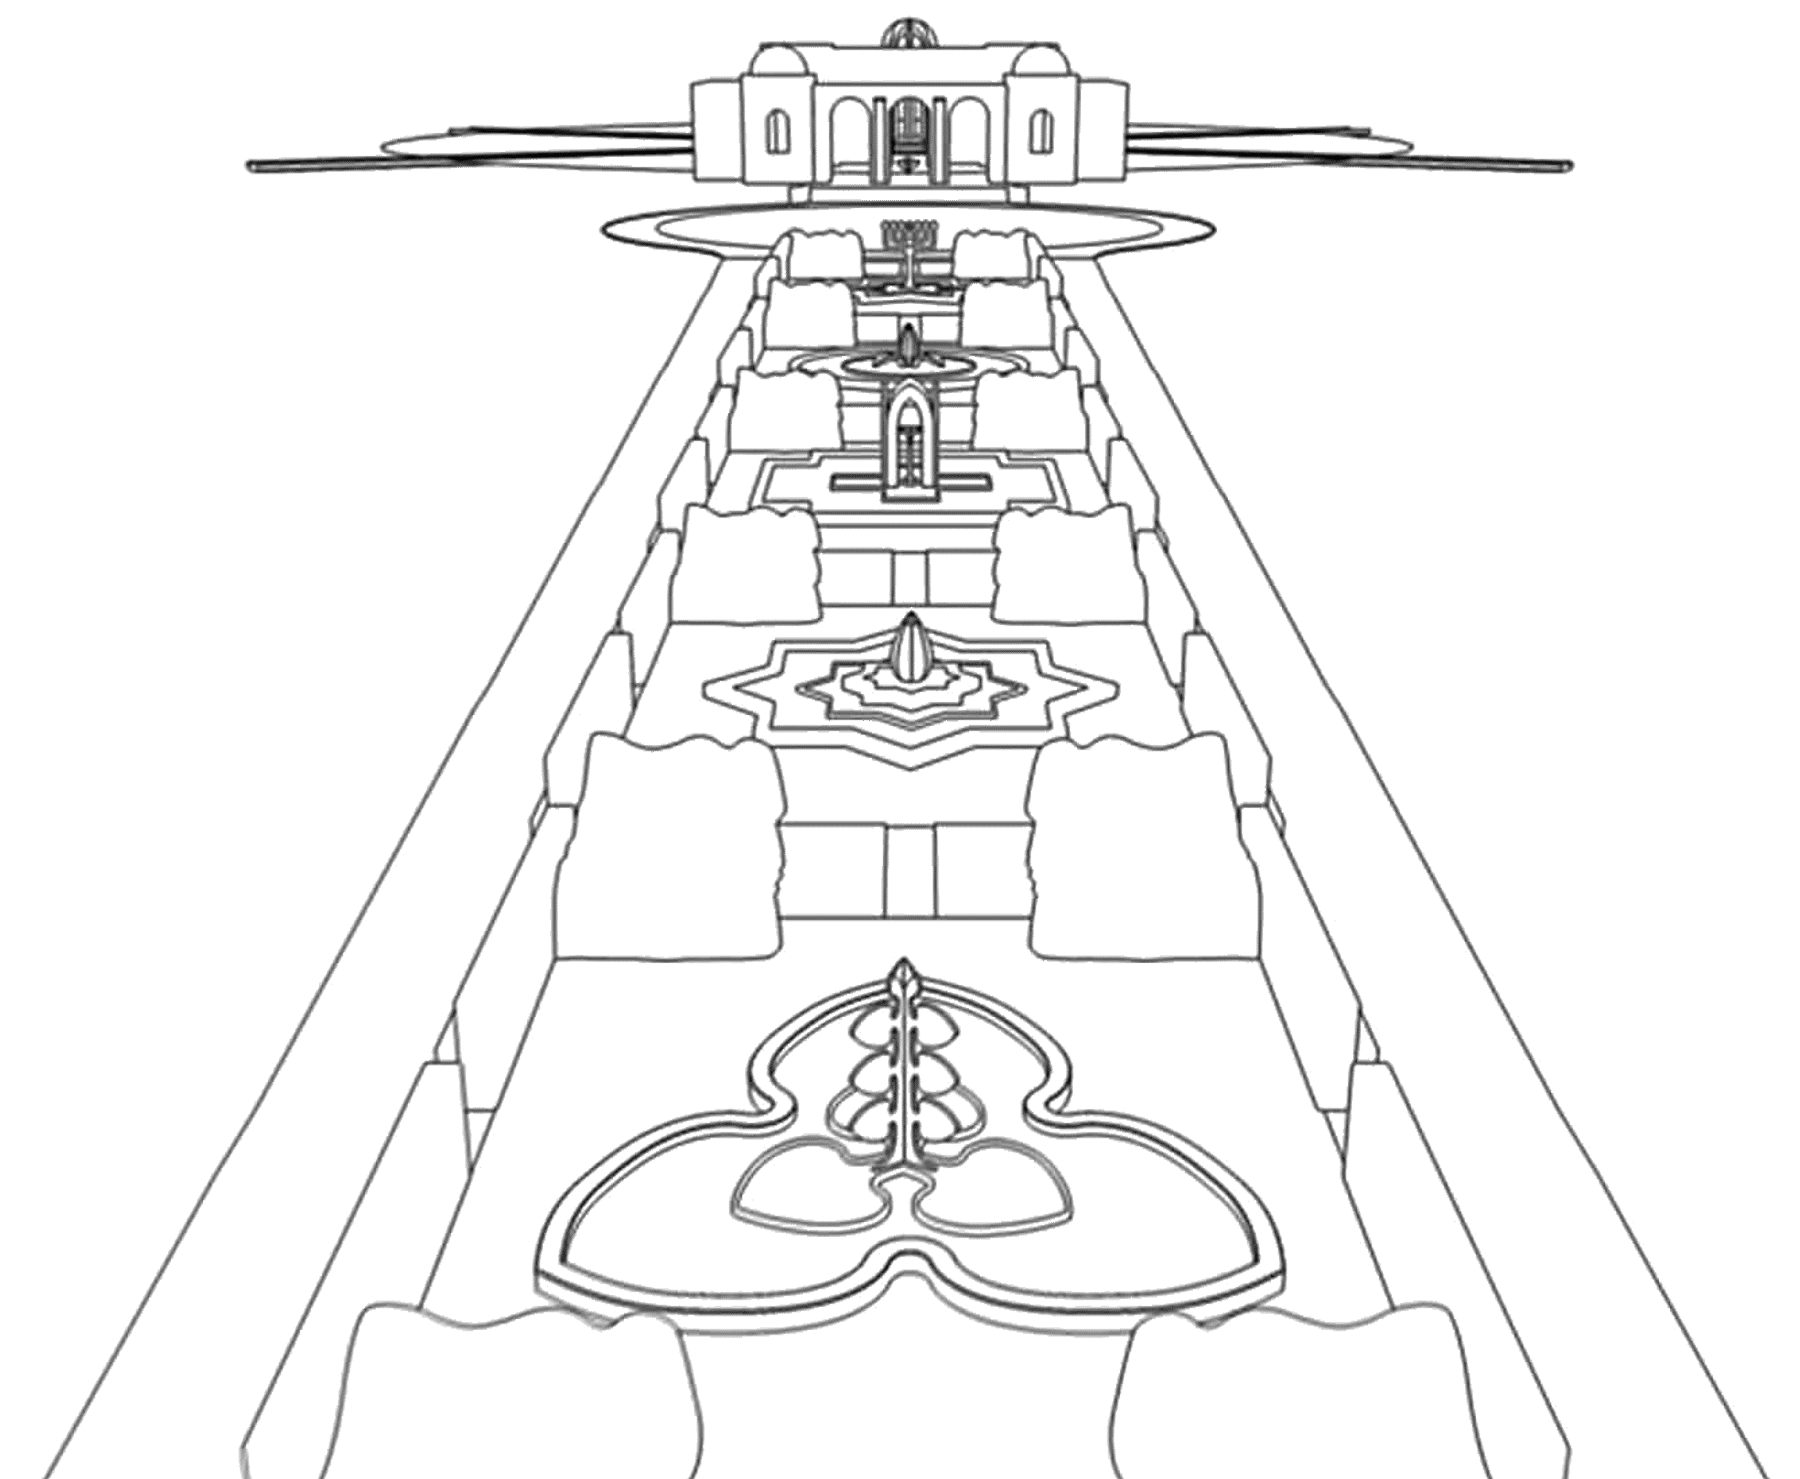 vector download Gardens huub adelheid kortekaas. Spiritual drawing.